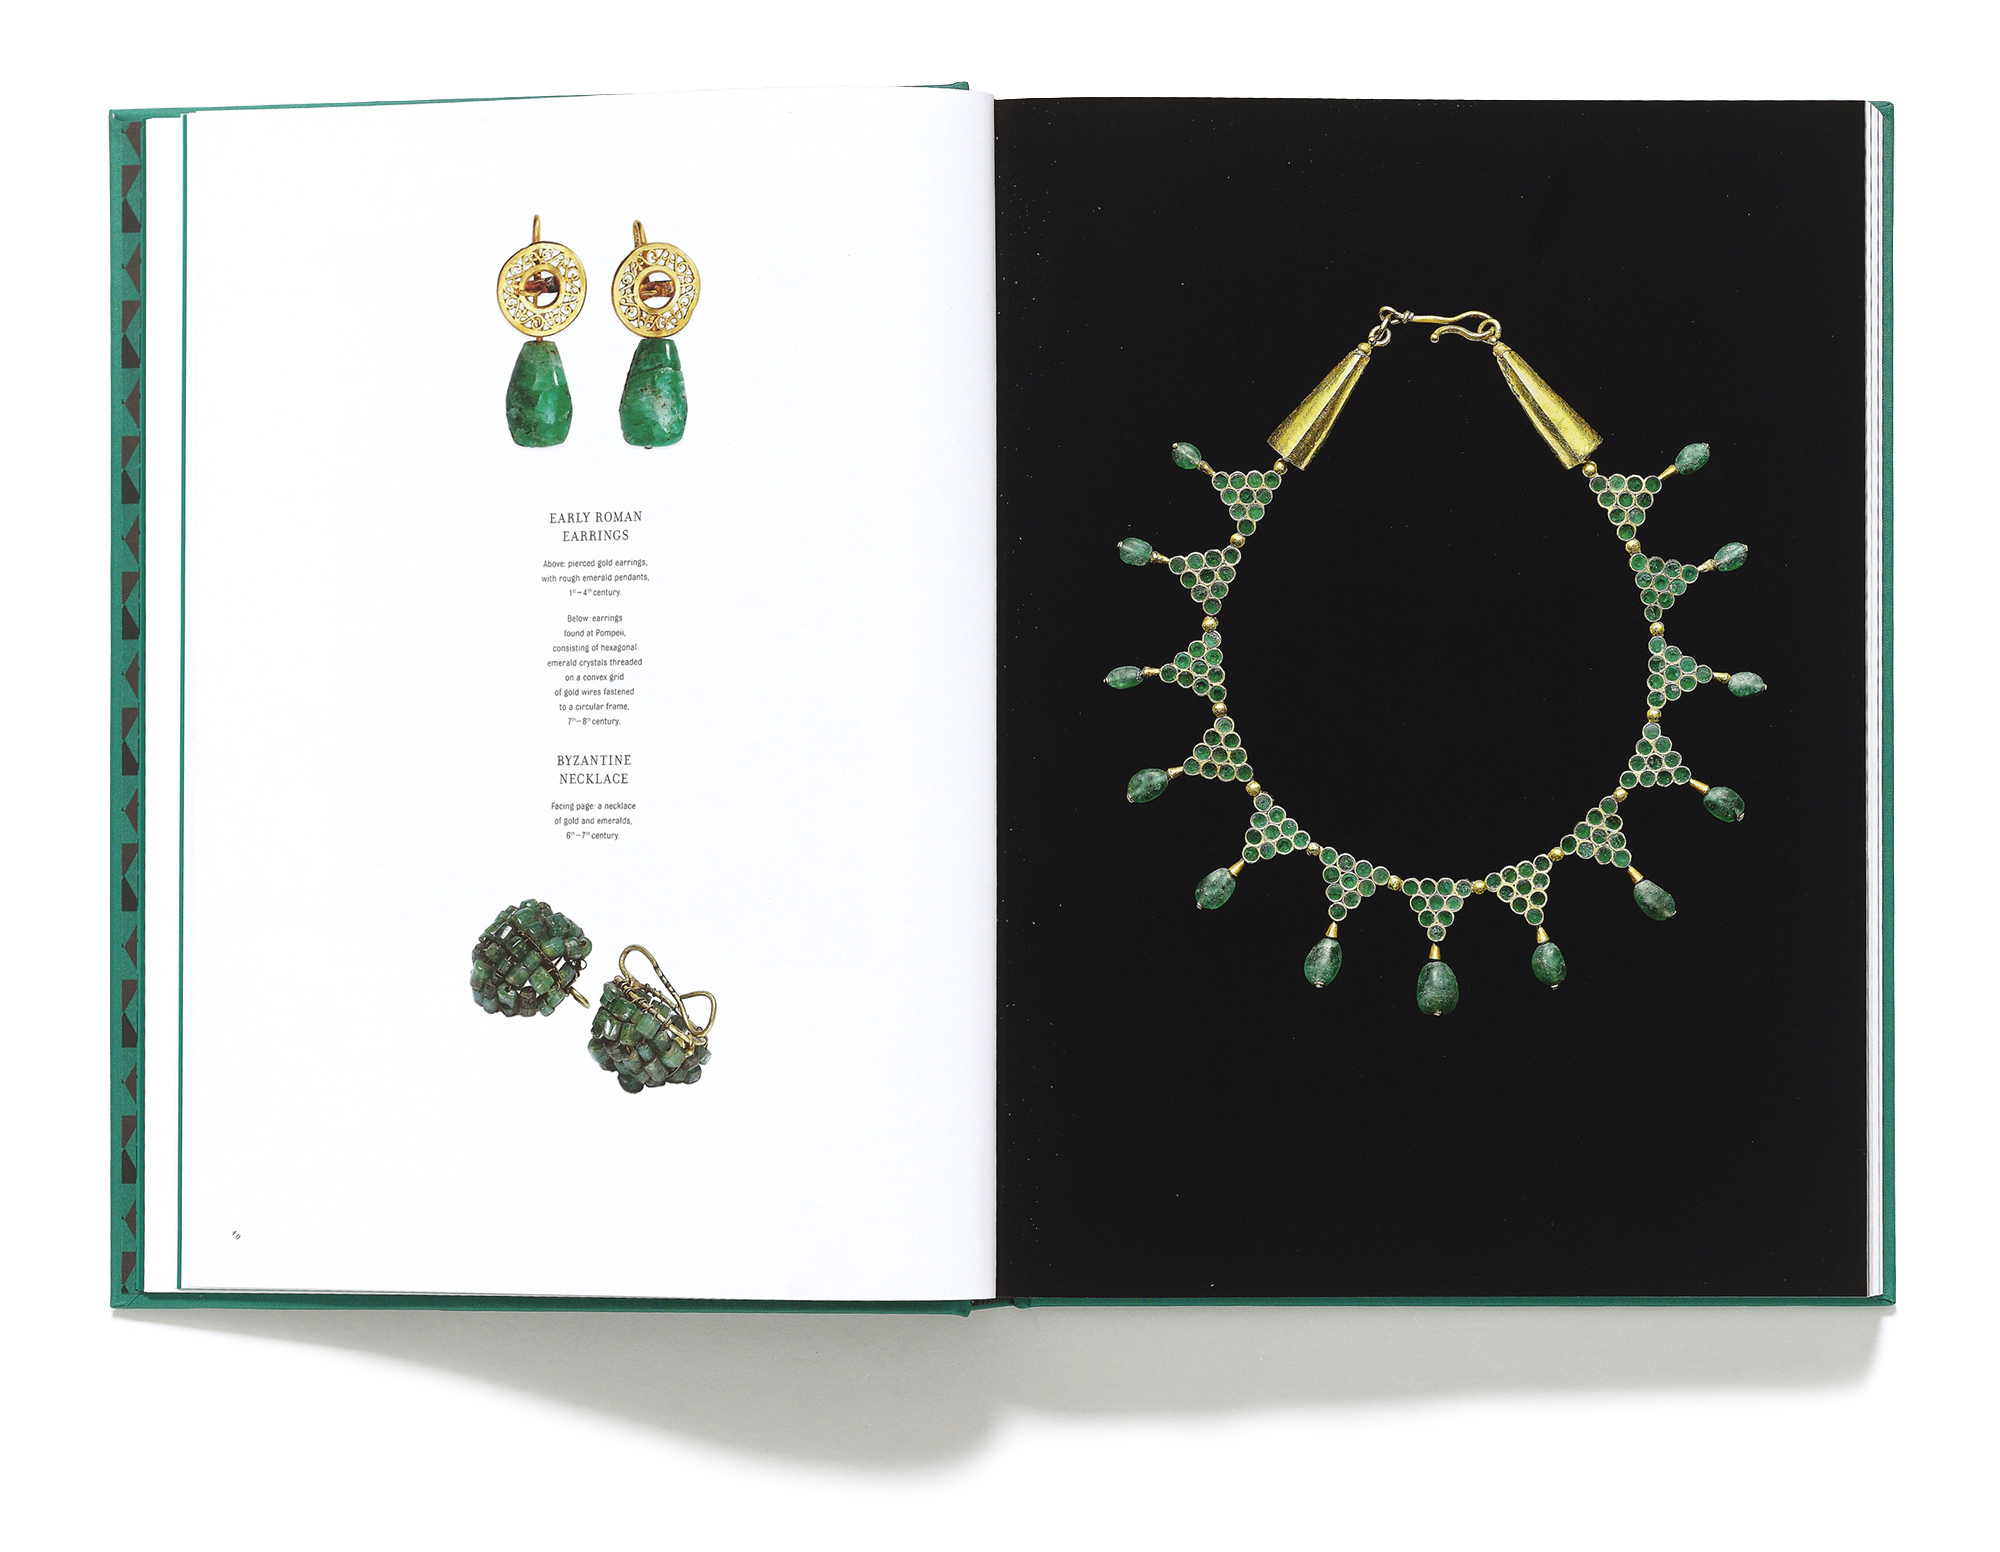 Emerald_Violette Editions_24.jpg